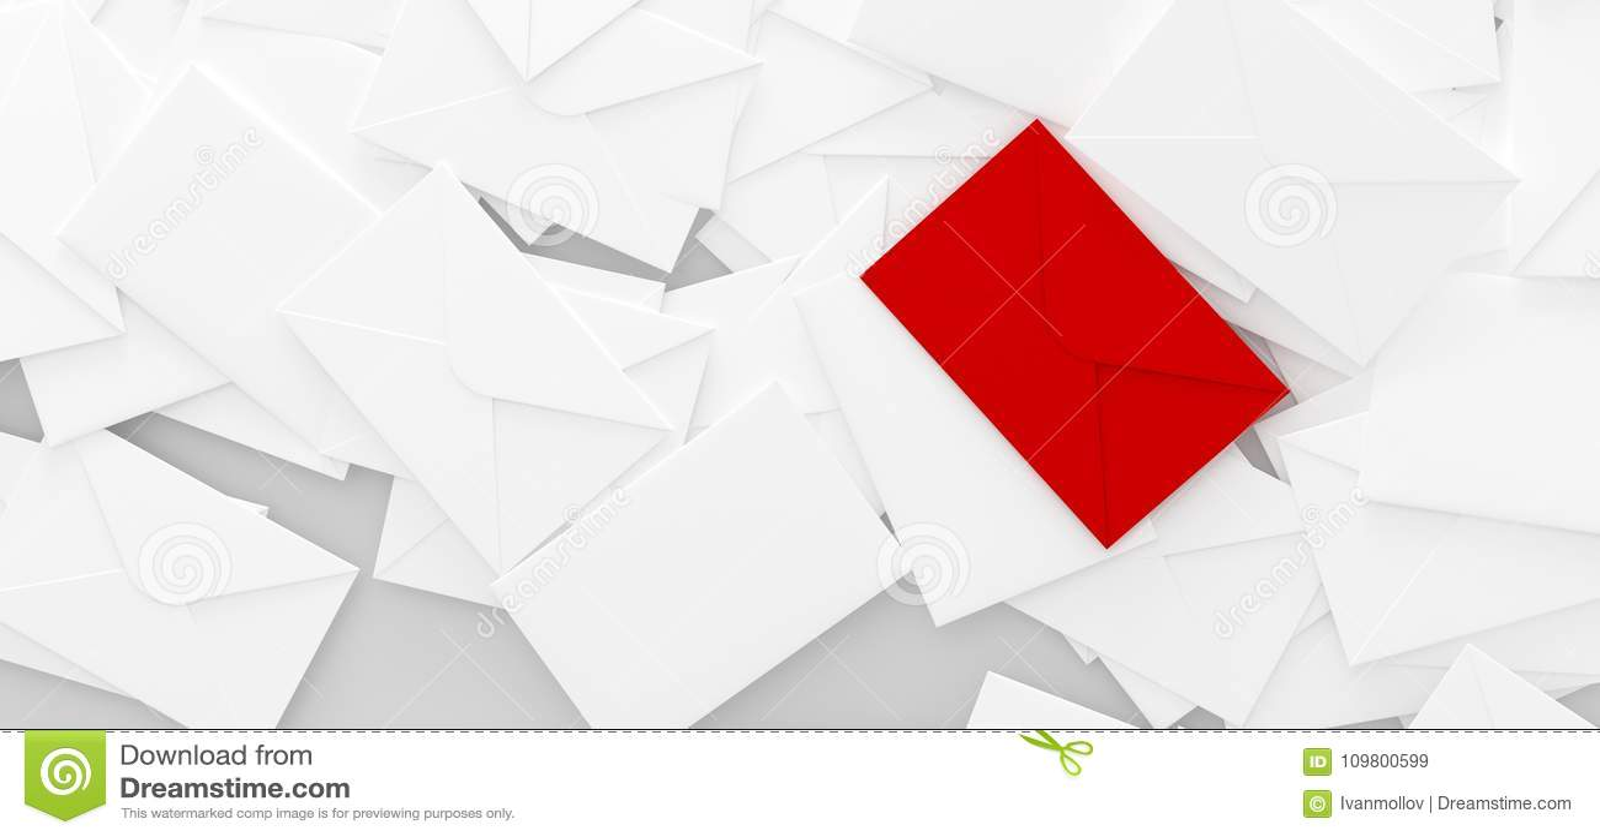 Pile Letters Stock Illustrations – 1,471 Pile Letters ...